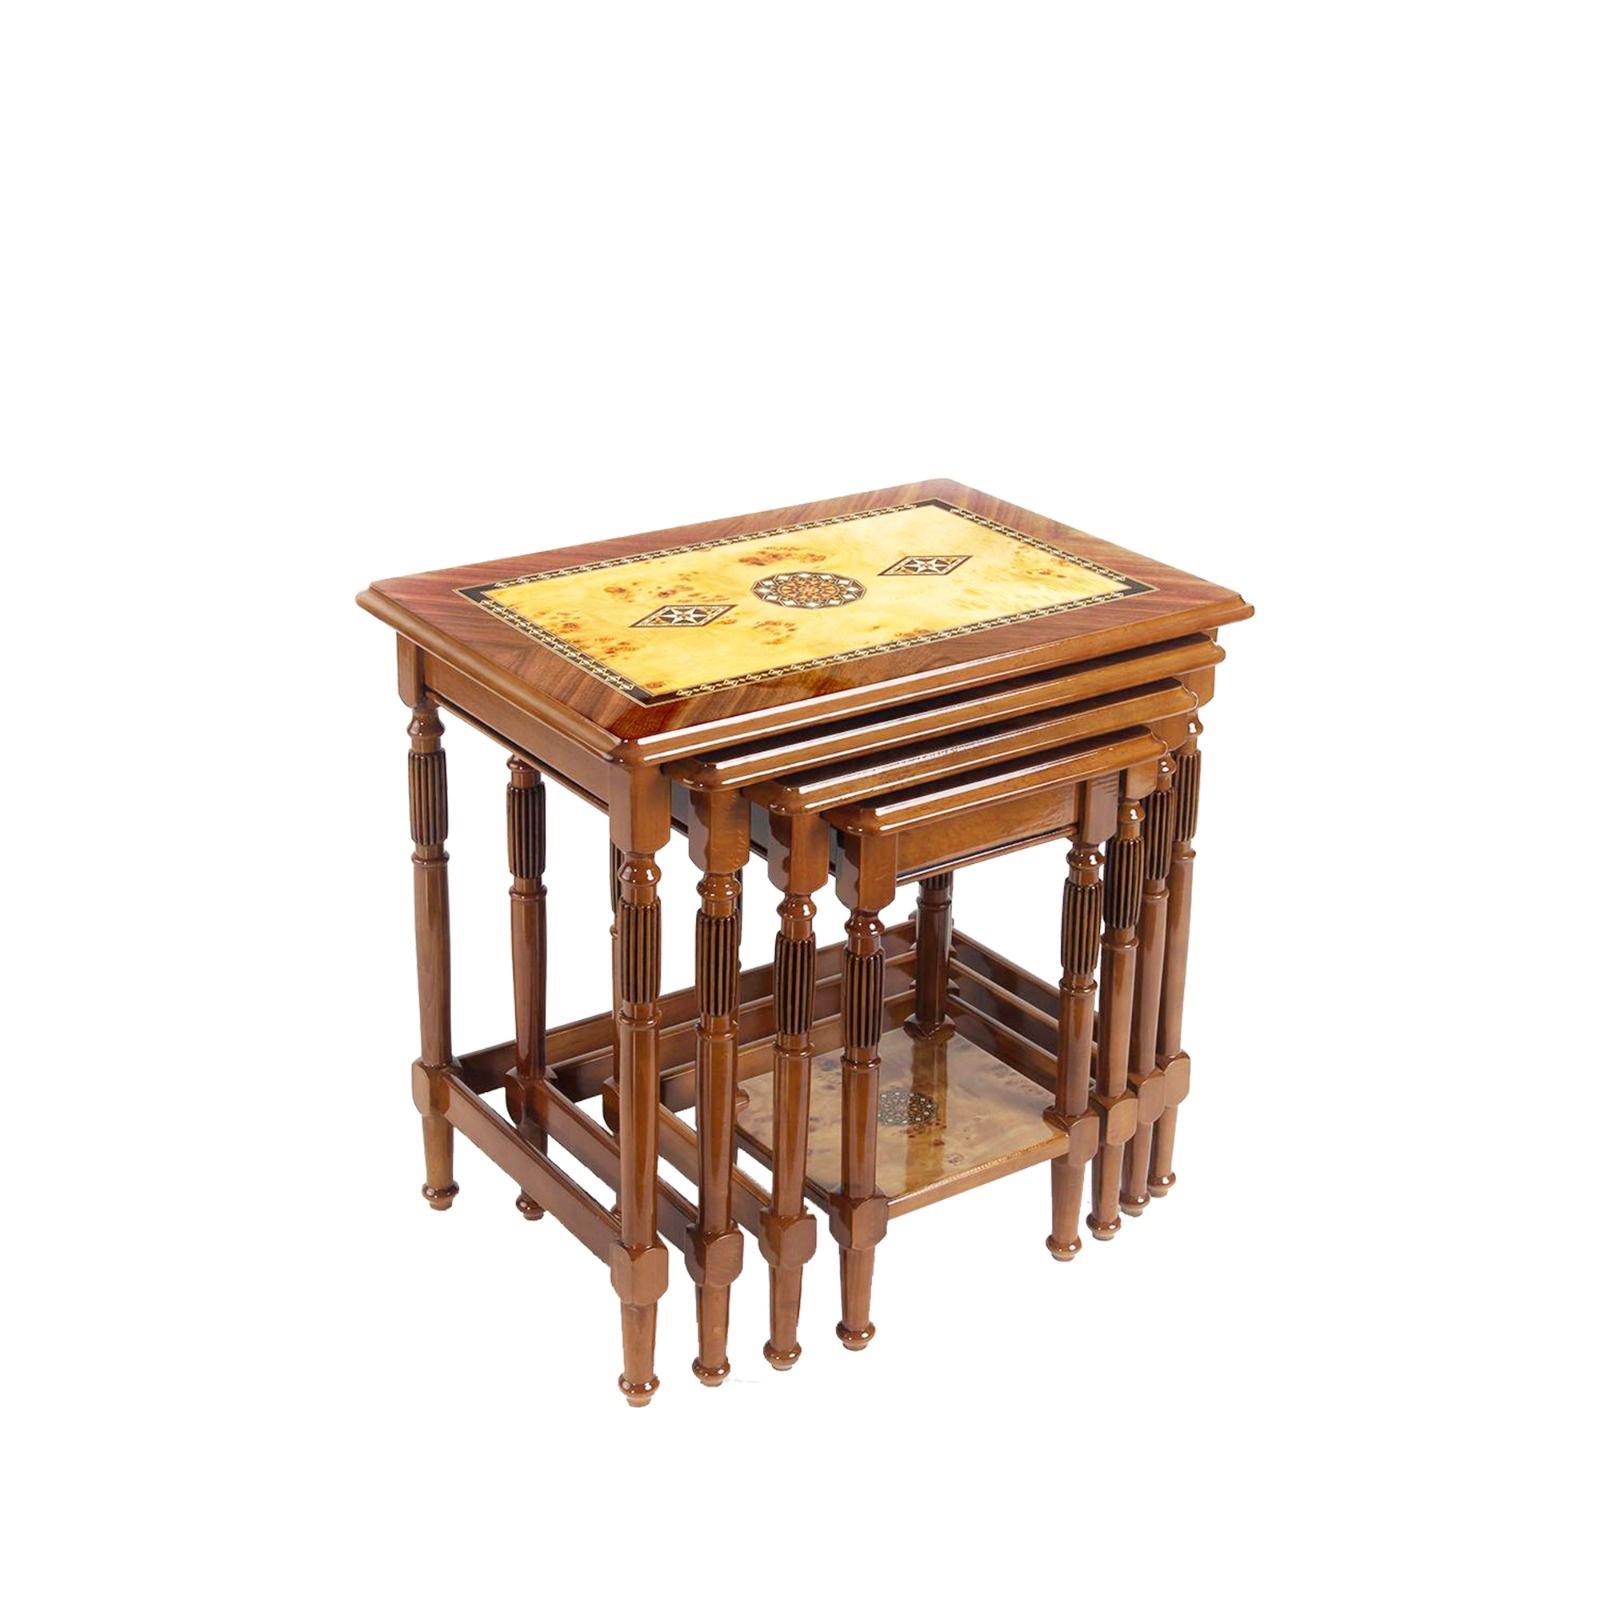 Buy Brown & Biege Deluxe Wooden Nest of Tables